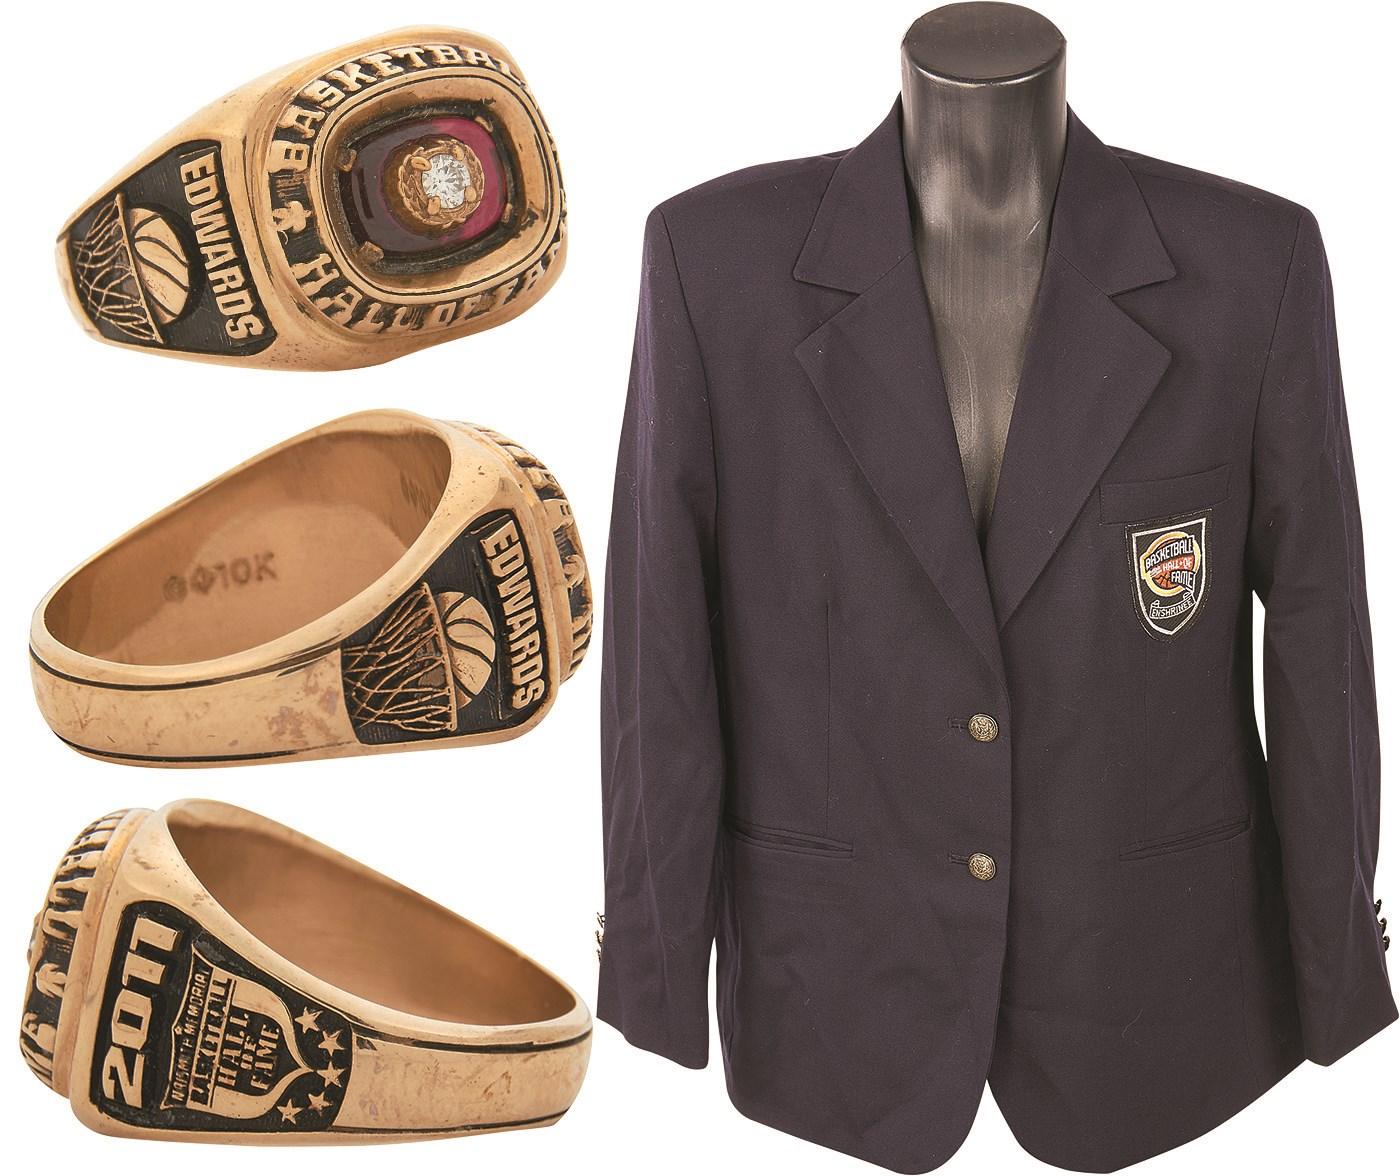 6a55e98f709 2011 Naismith Memorial Basketball Hall of Fame Ring   Jacket Presented to Teresa  Edwards